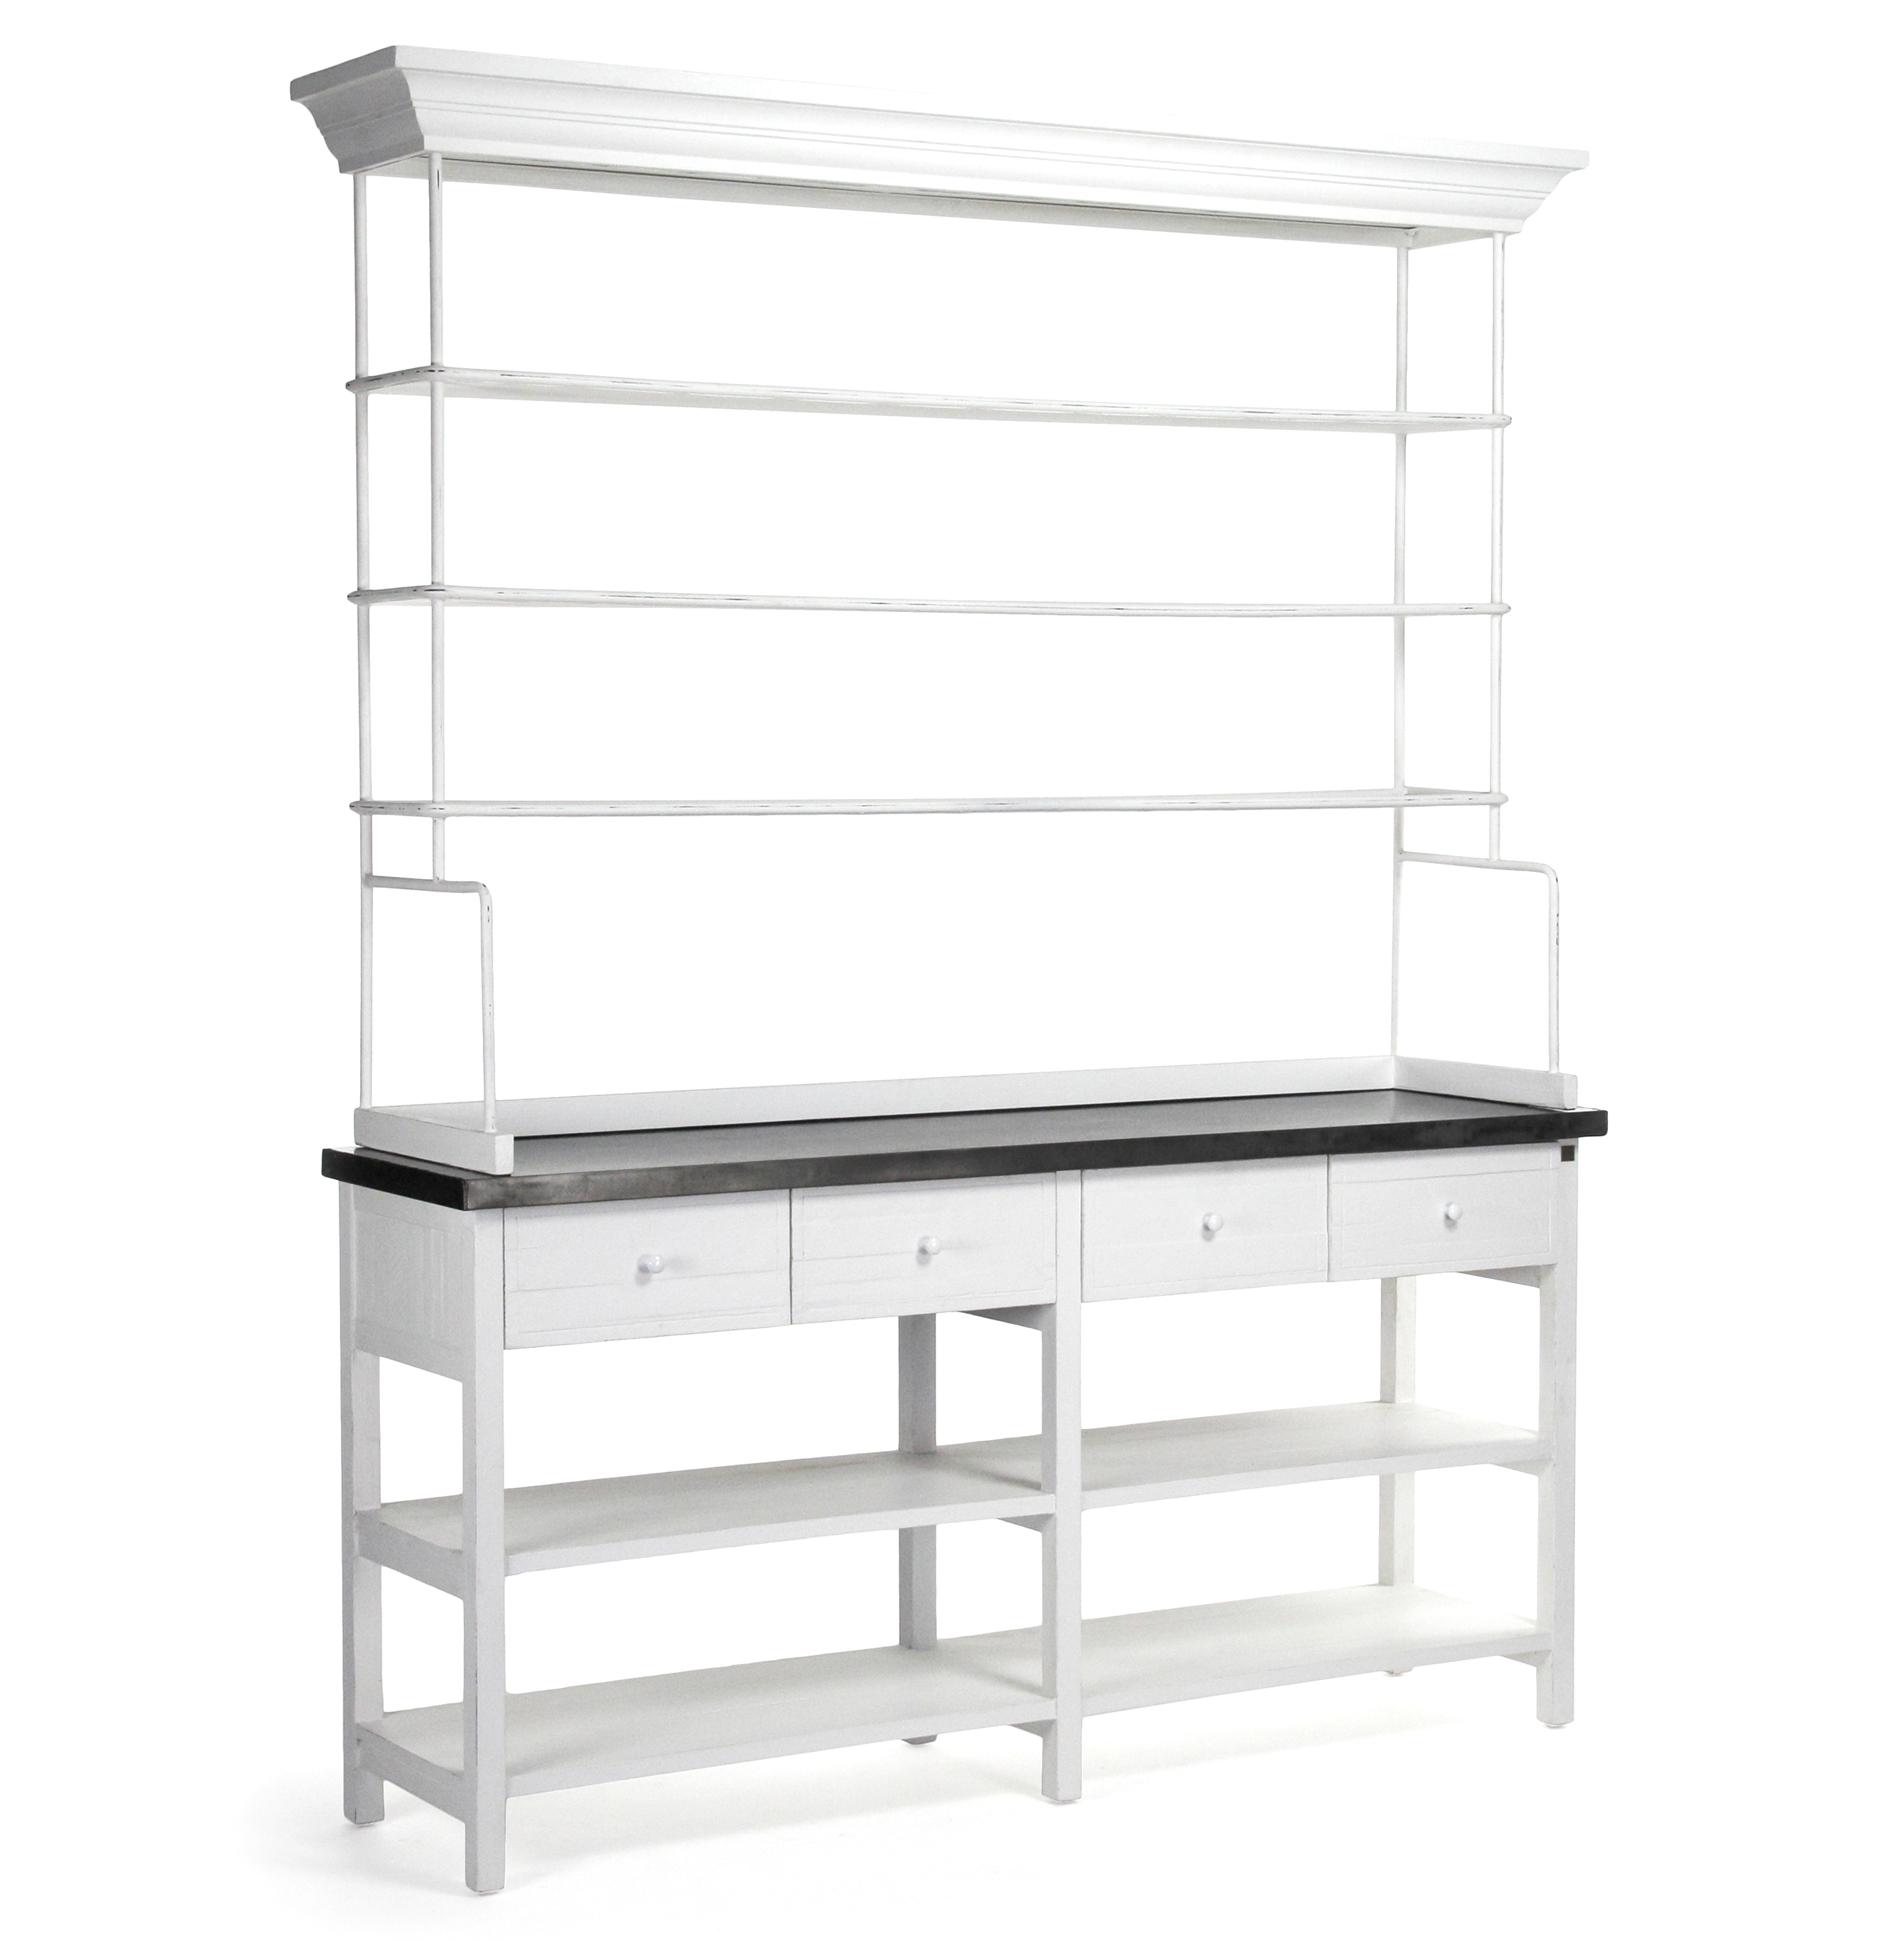 Marion Classic White Industrial Metal Large Display Shelf Bakers Rack